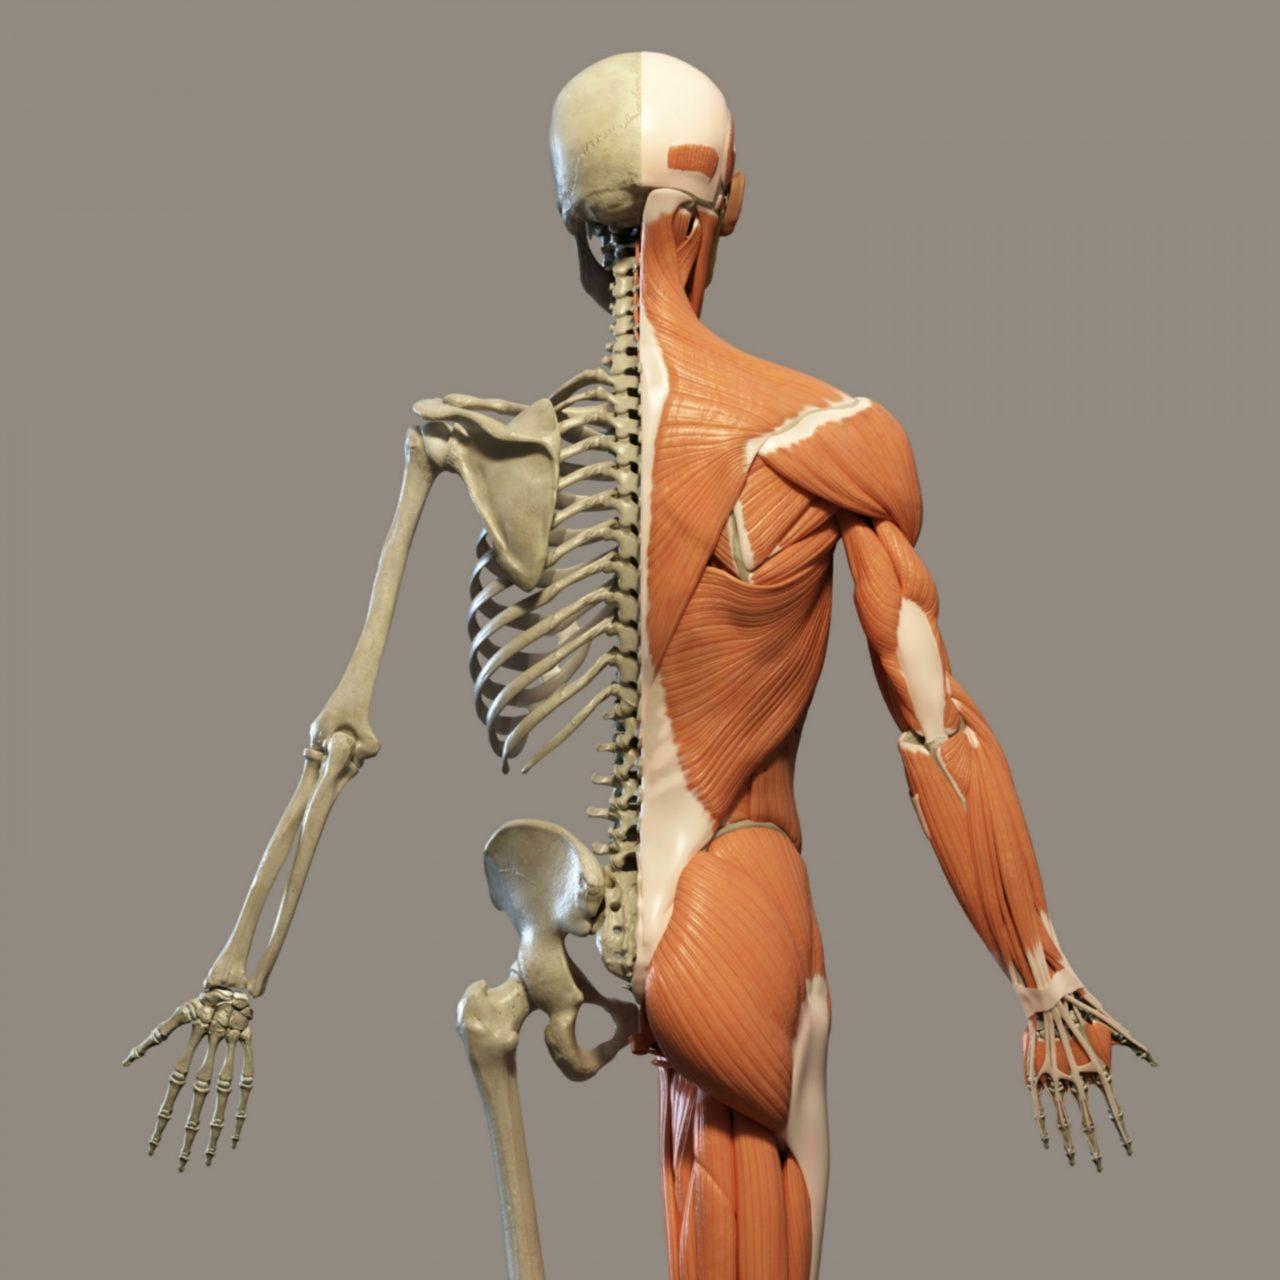 human-anatomy-1517257408wSc